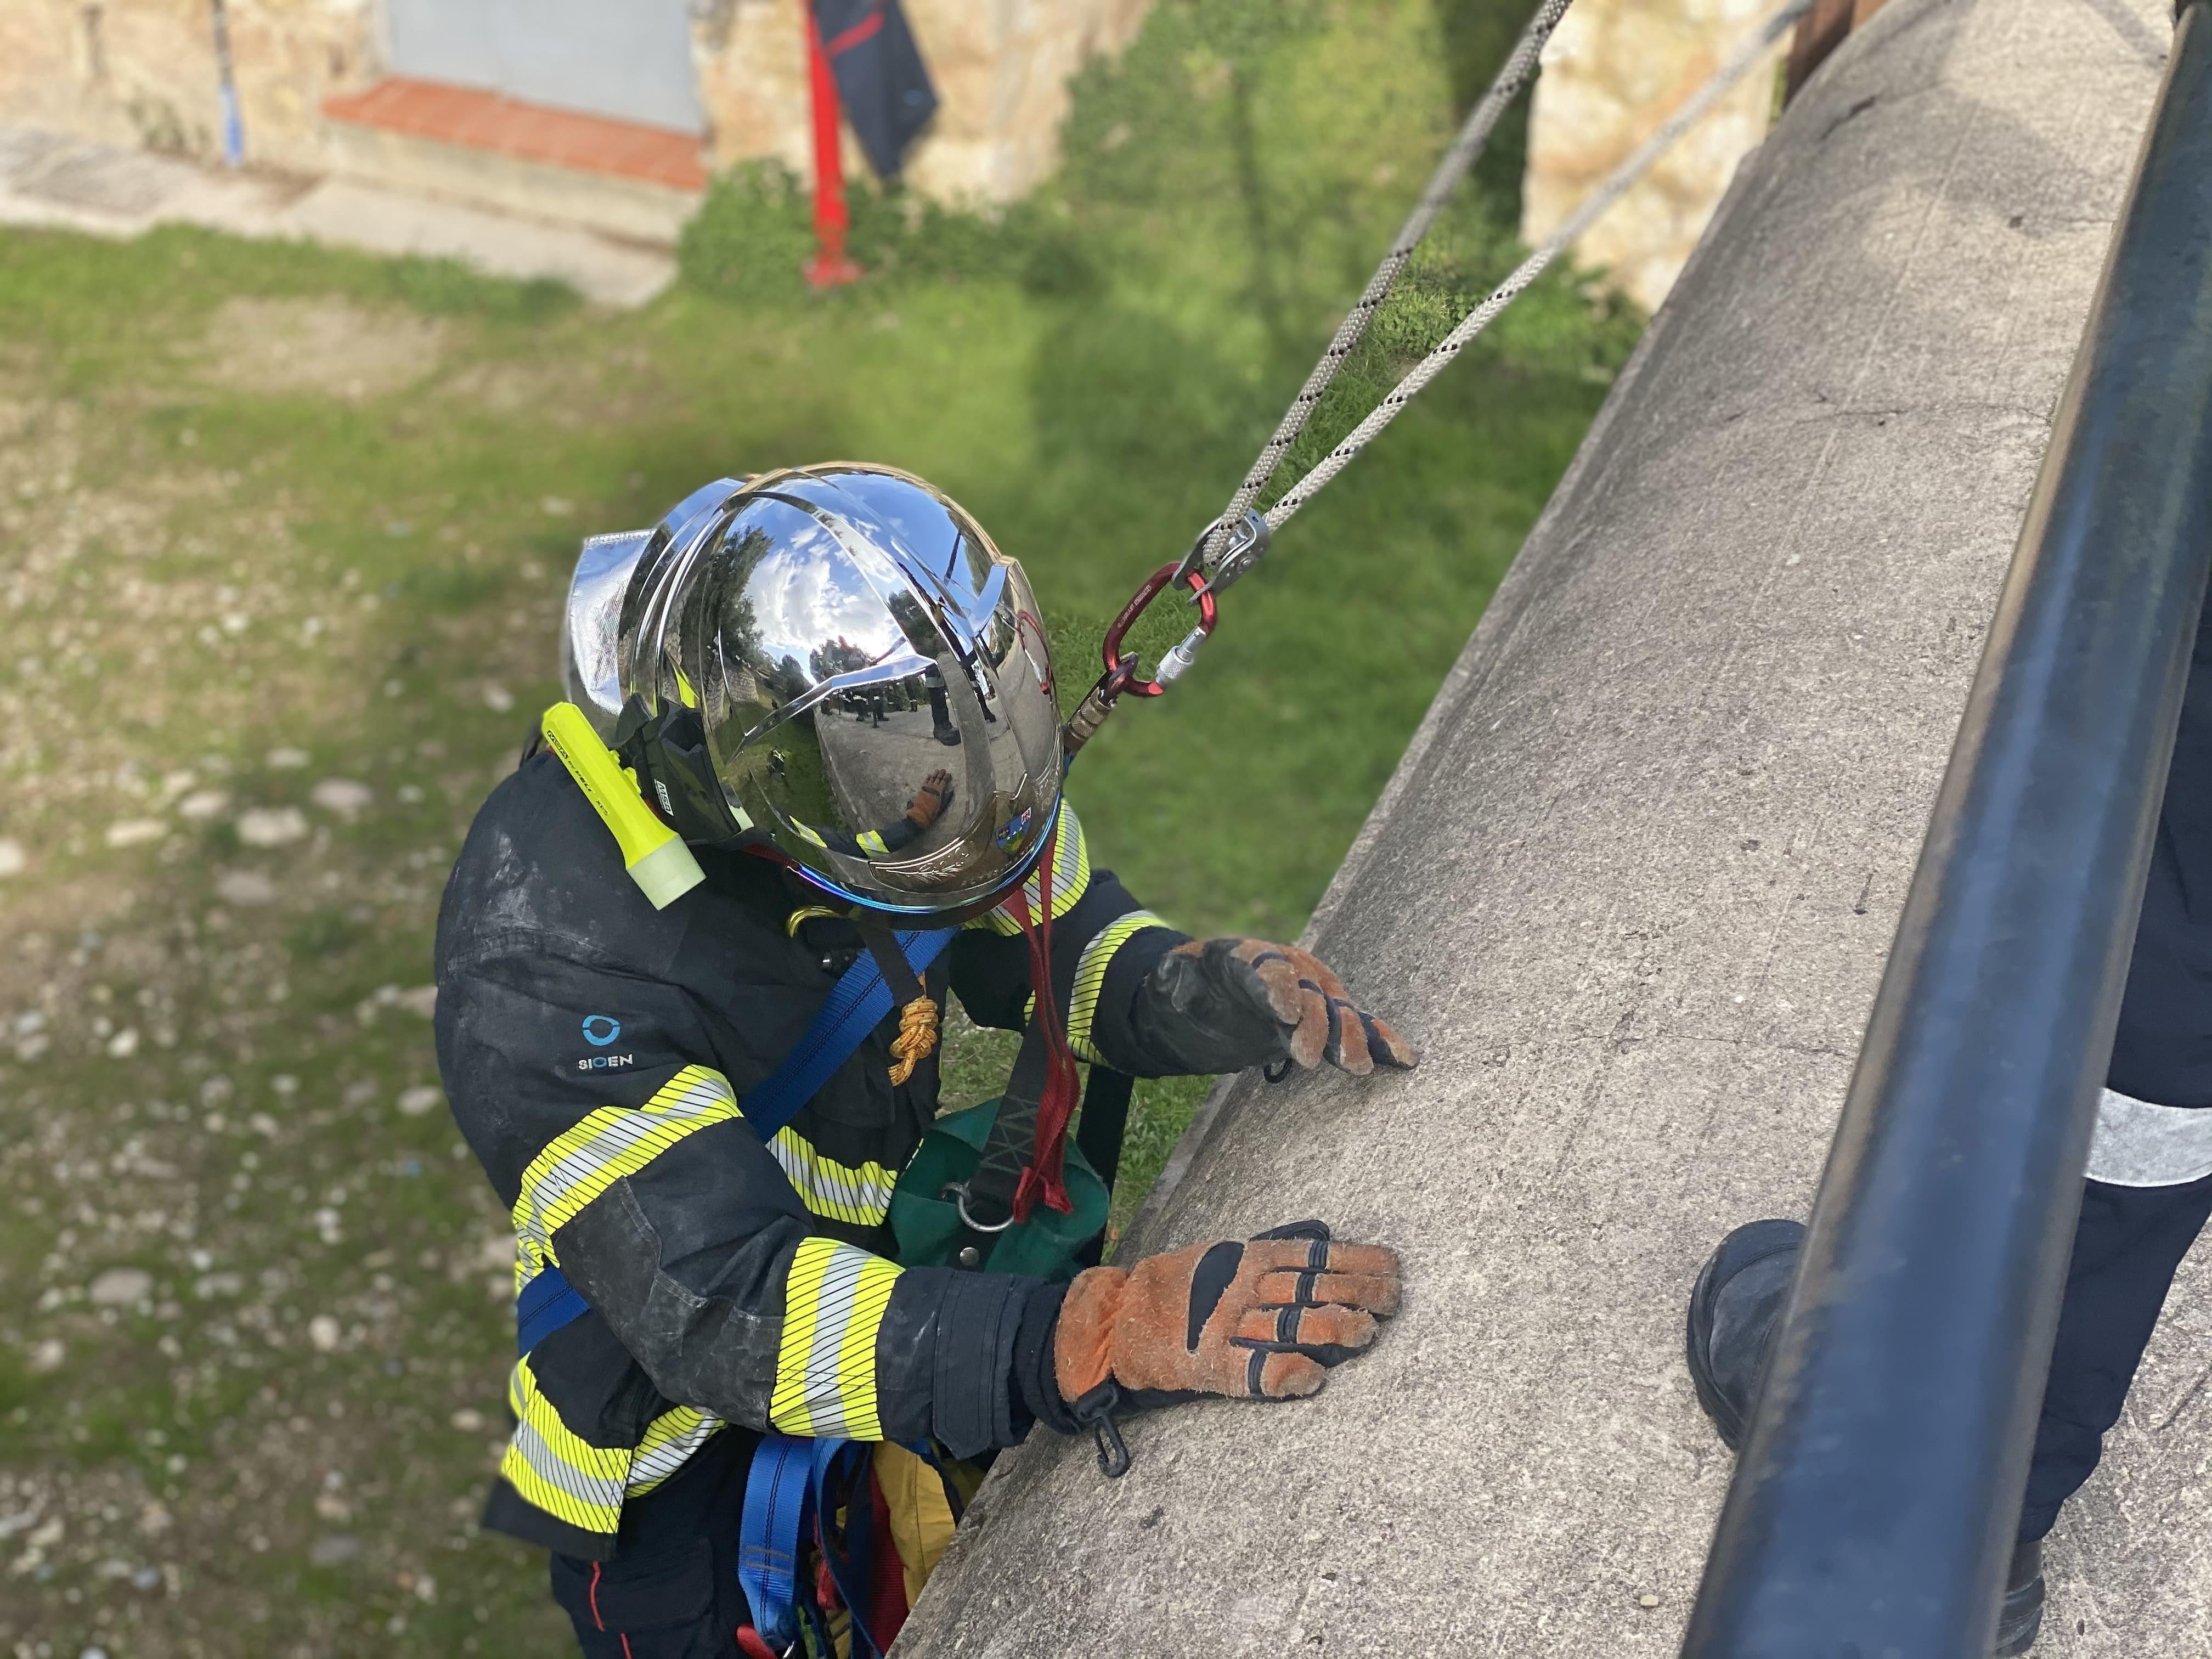 Fi Spv - Compagnie de Nice Spv - Compagnie de Nice (Module Incendie)